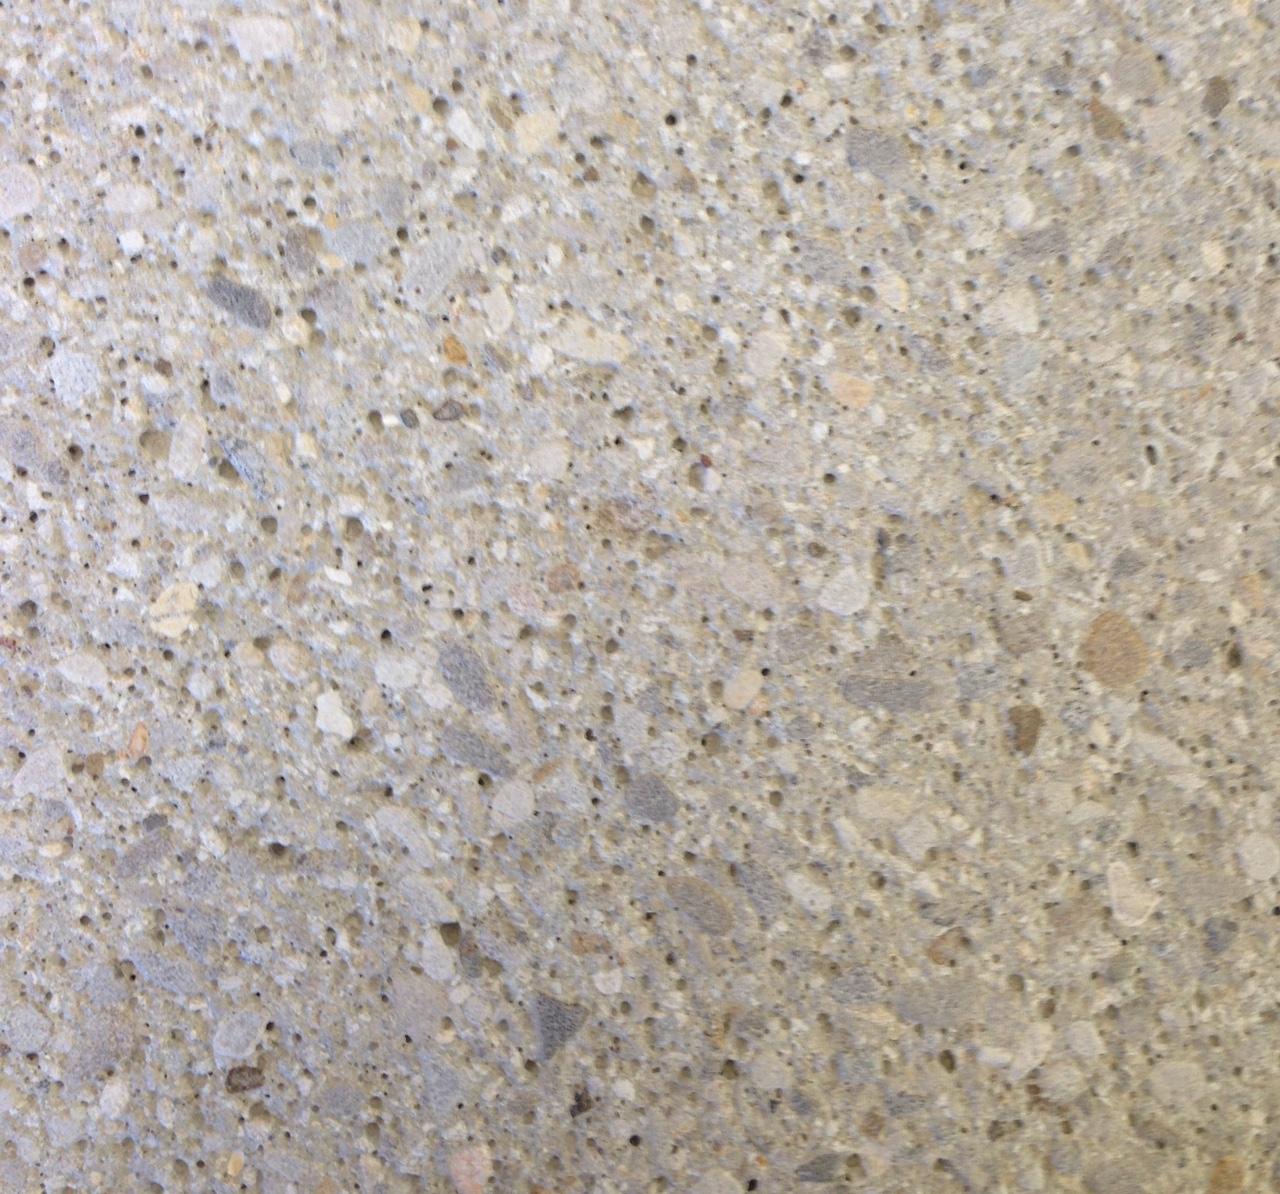 concrete with fine stones, sandblasted